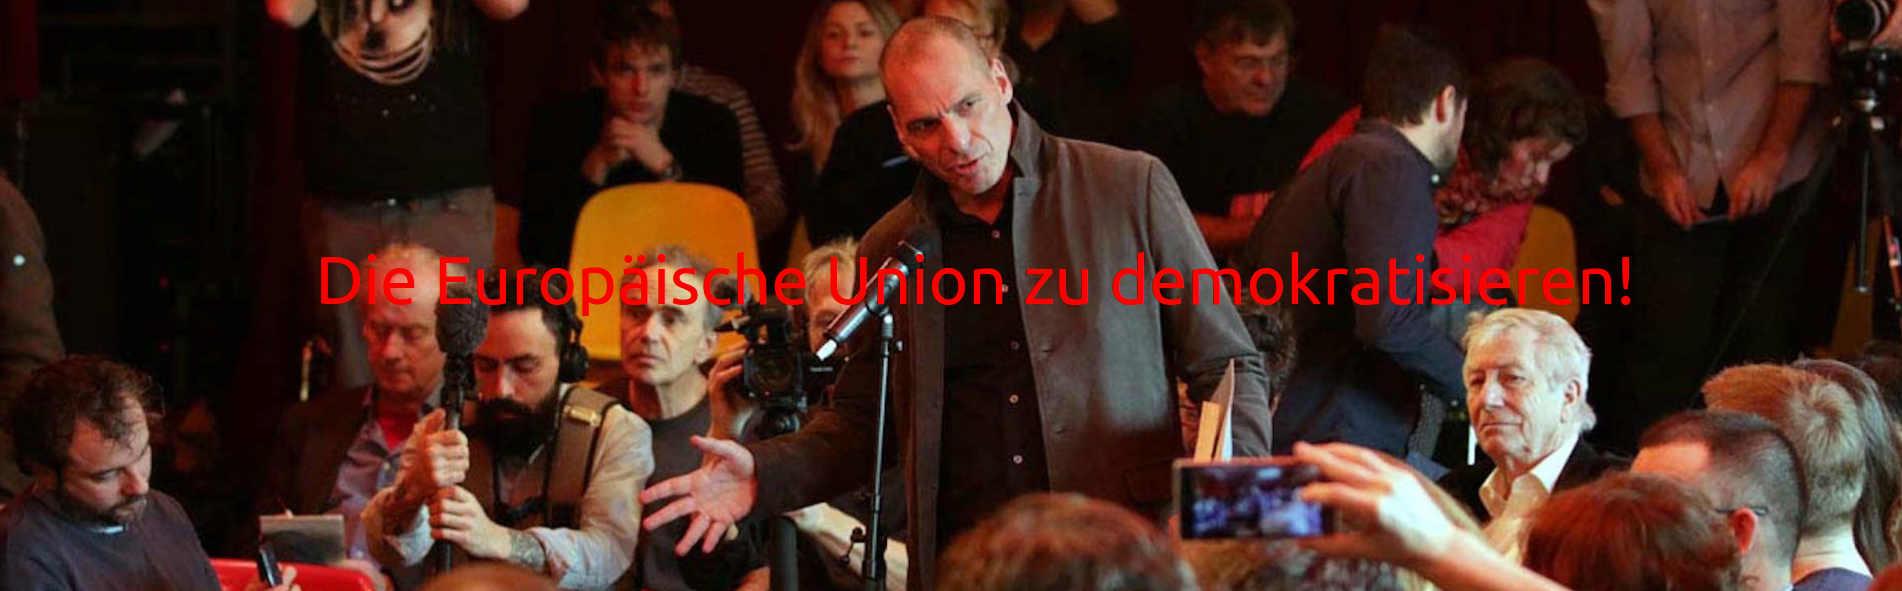 DiEM25.org